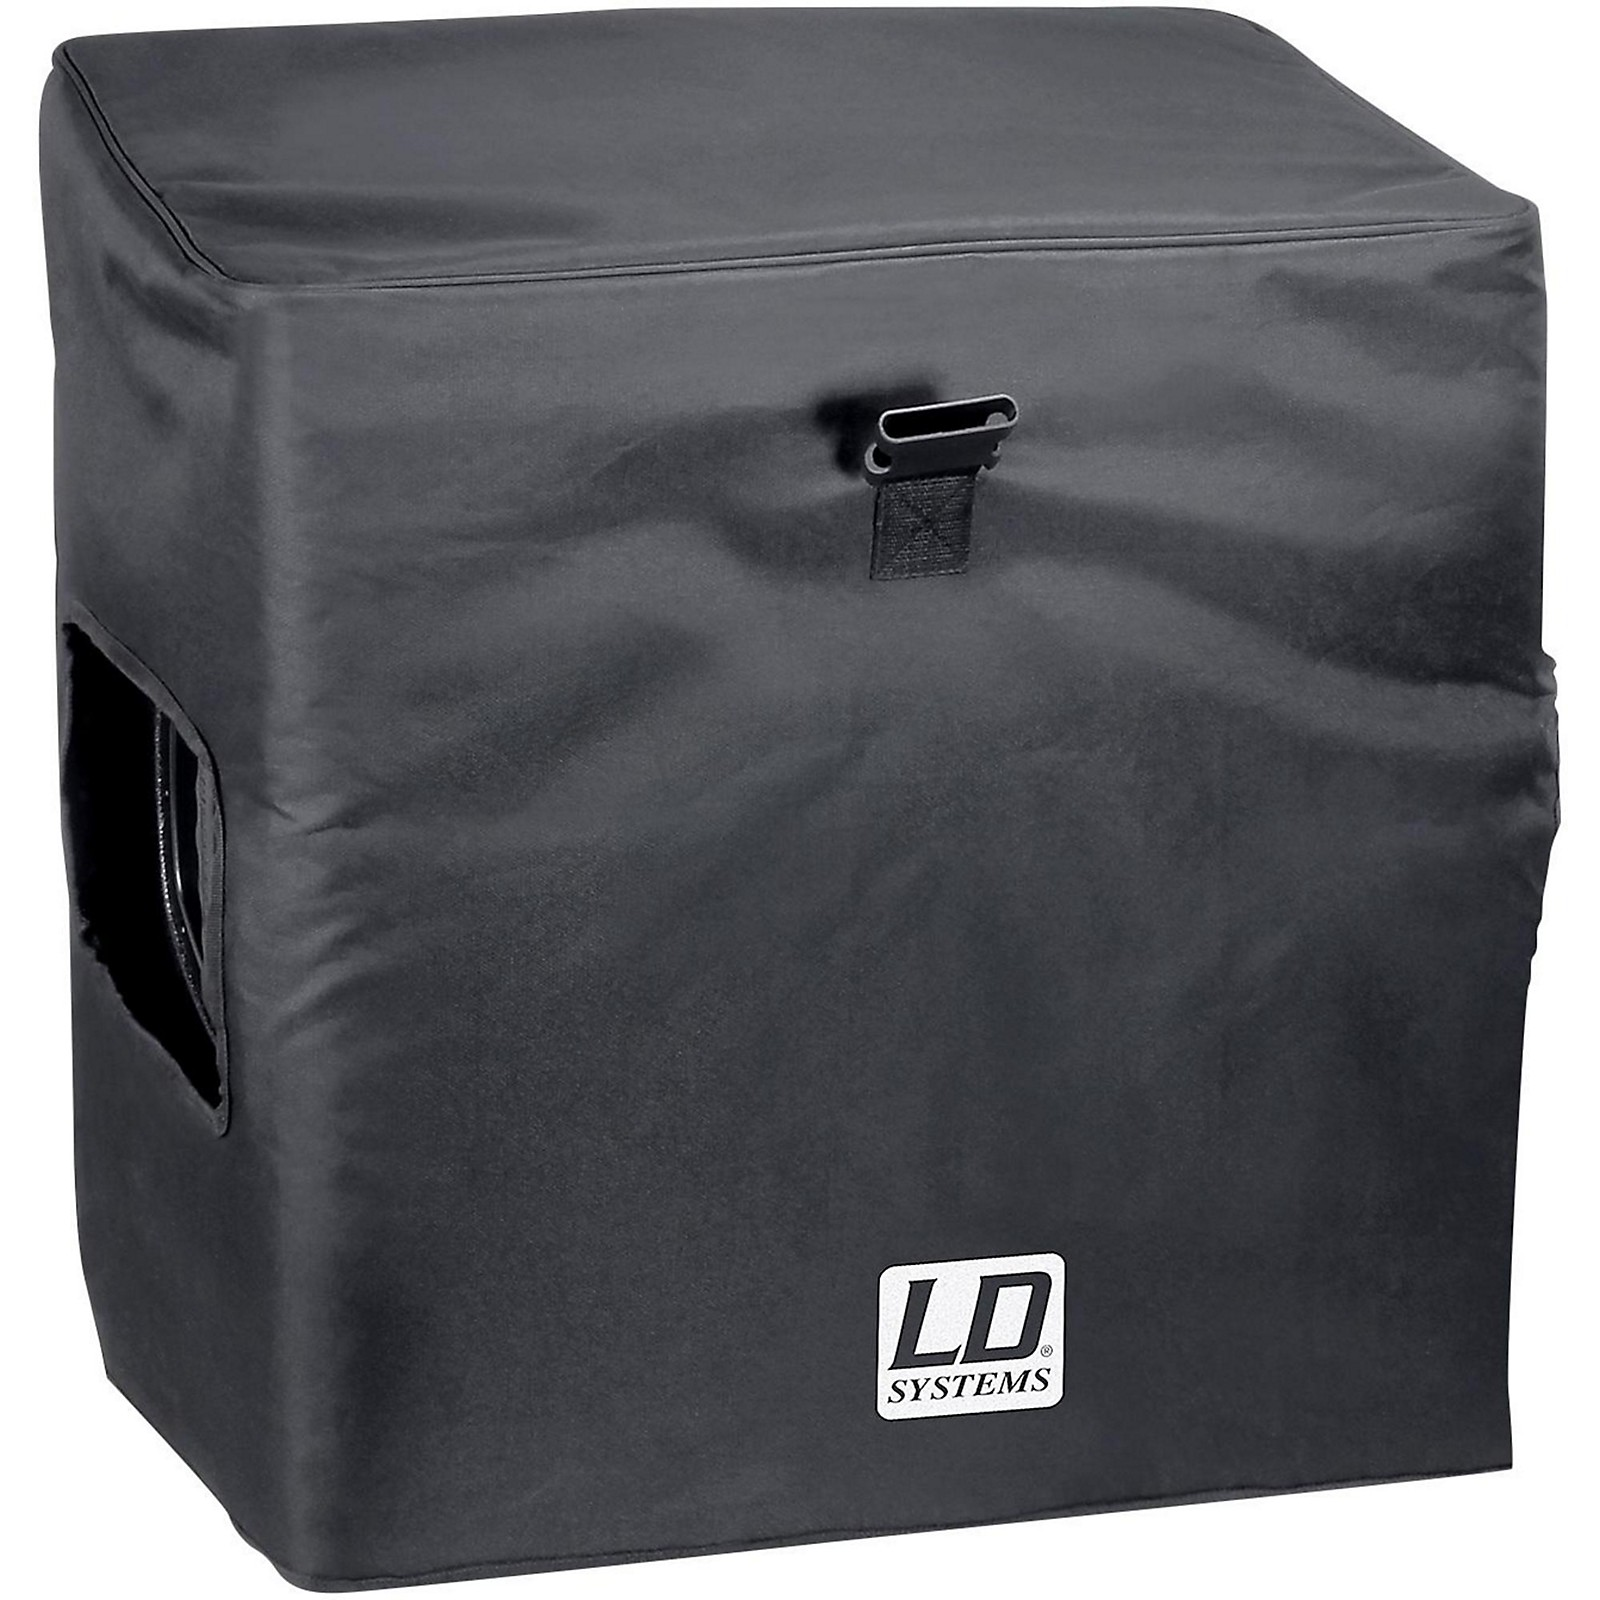 LD Systems MAUI 44 Sub Protective Cover